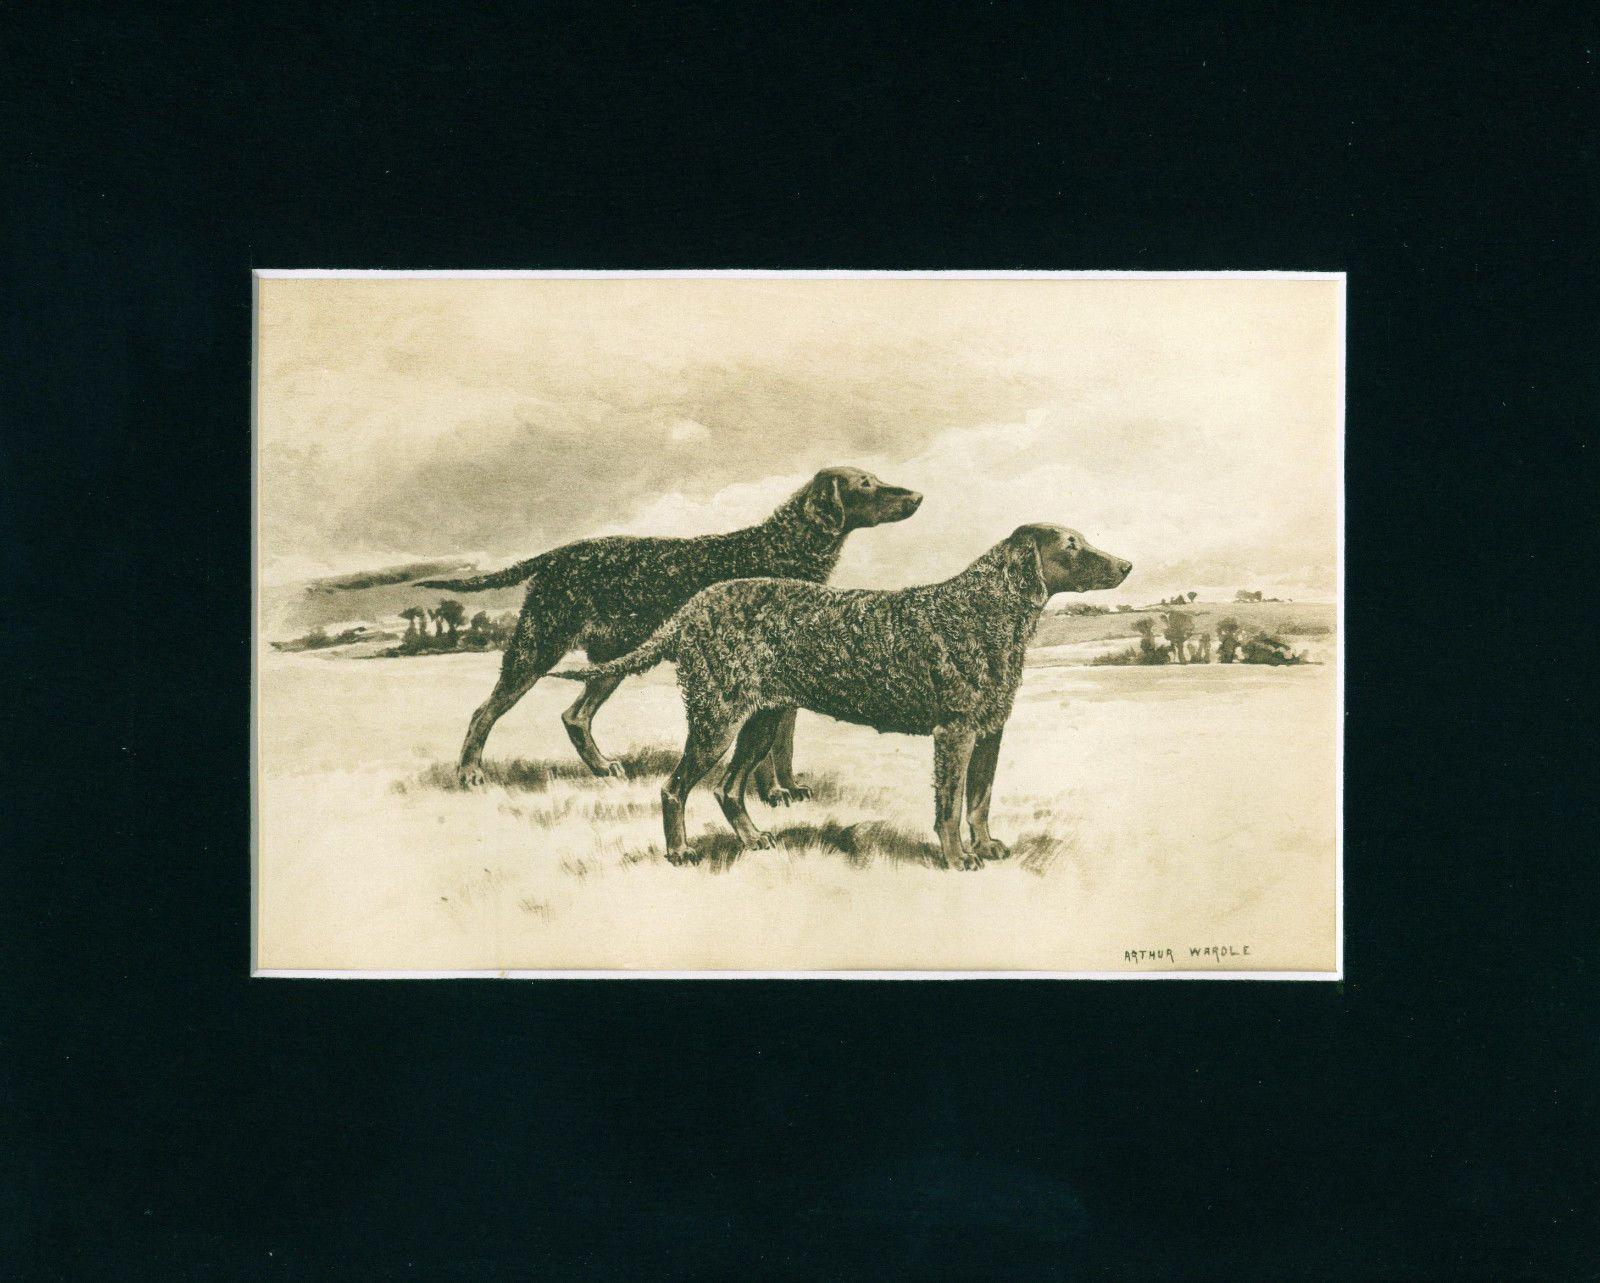 Dog Print 1906 Curly Coated Retriever Dogs by Arthur